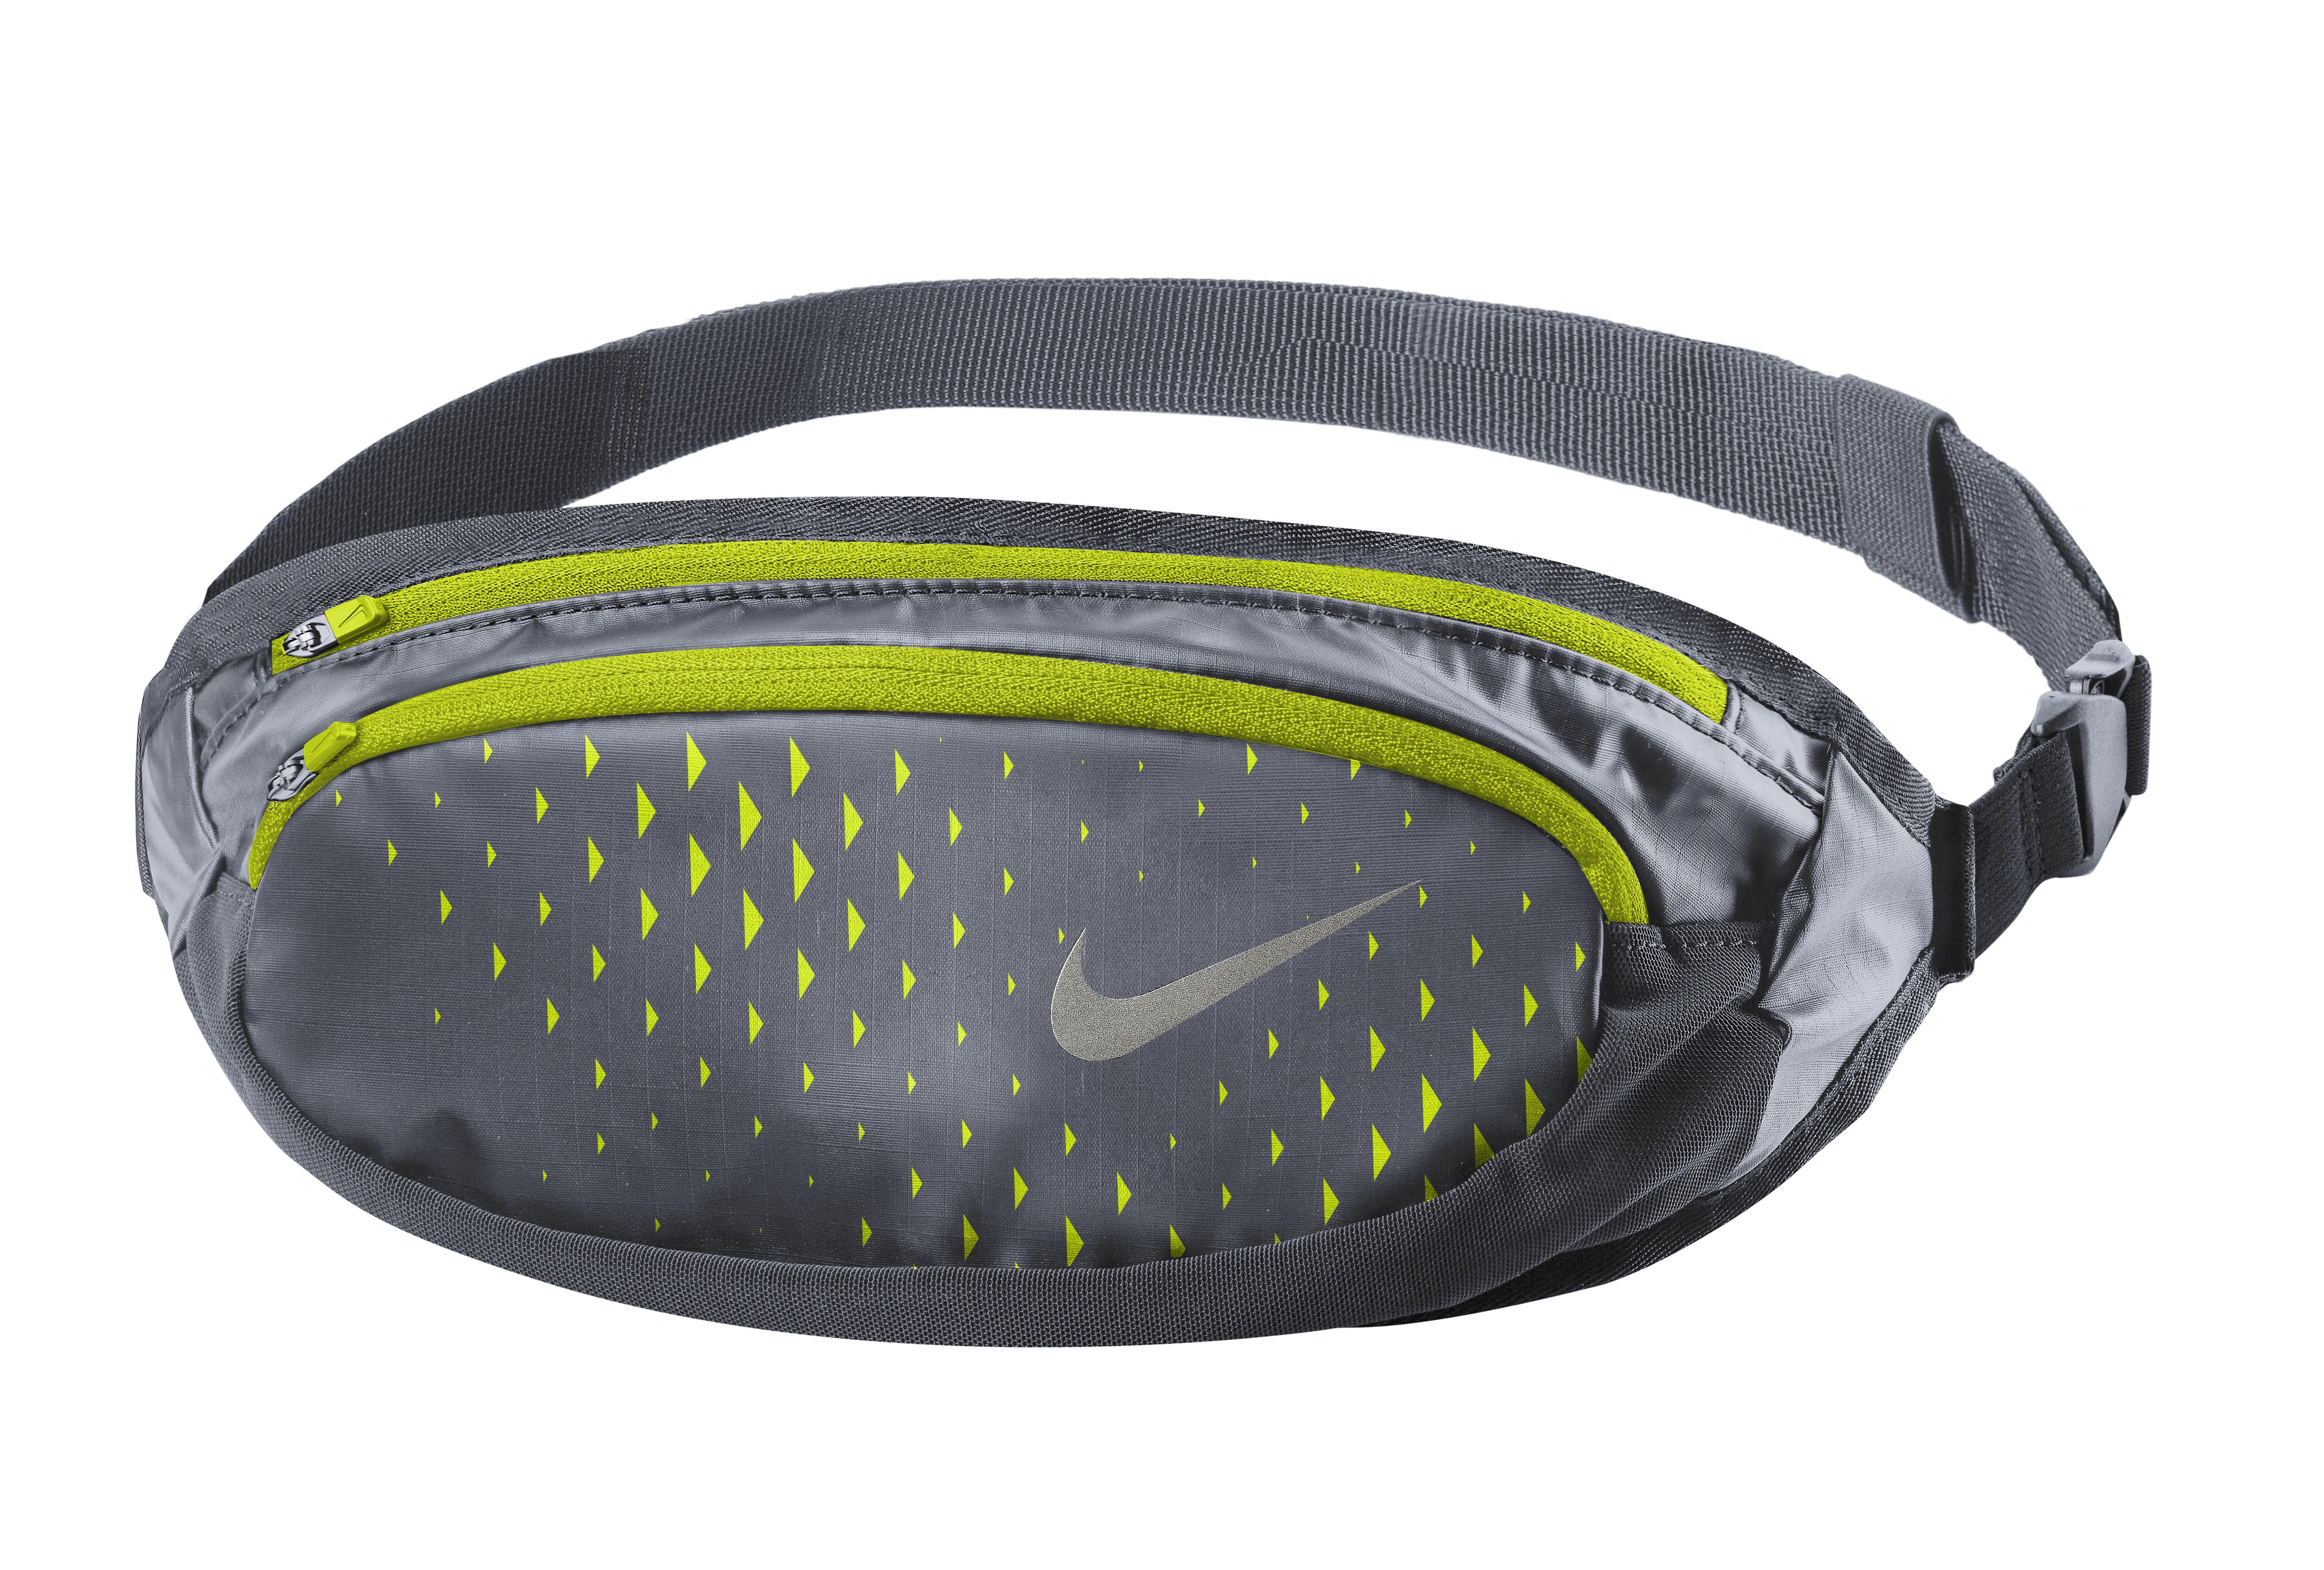 35b9c15786 Nike Large Capacity Waistpack Osfm N.rl.91.057 Férfi övtáska | Övtáska